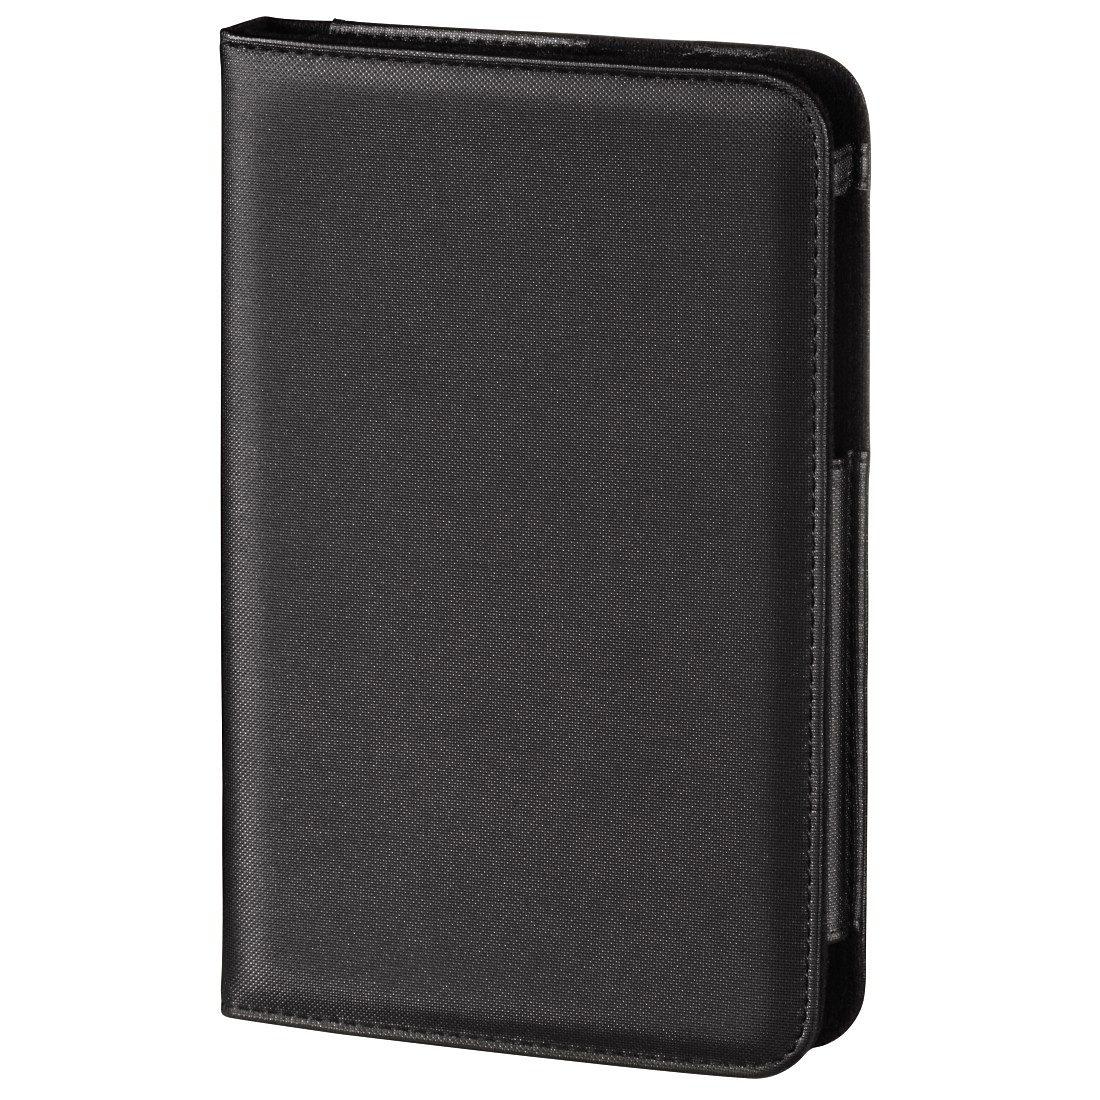 Hama Hülle Tasche f. Samsung Galaxy Tab A 9.7 Tablet Schutzhülle »Case Cover Etui Portfolio«